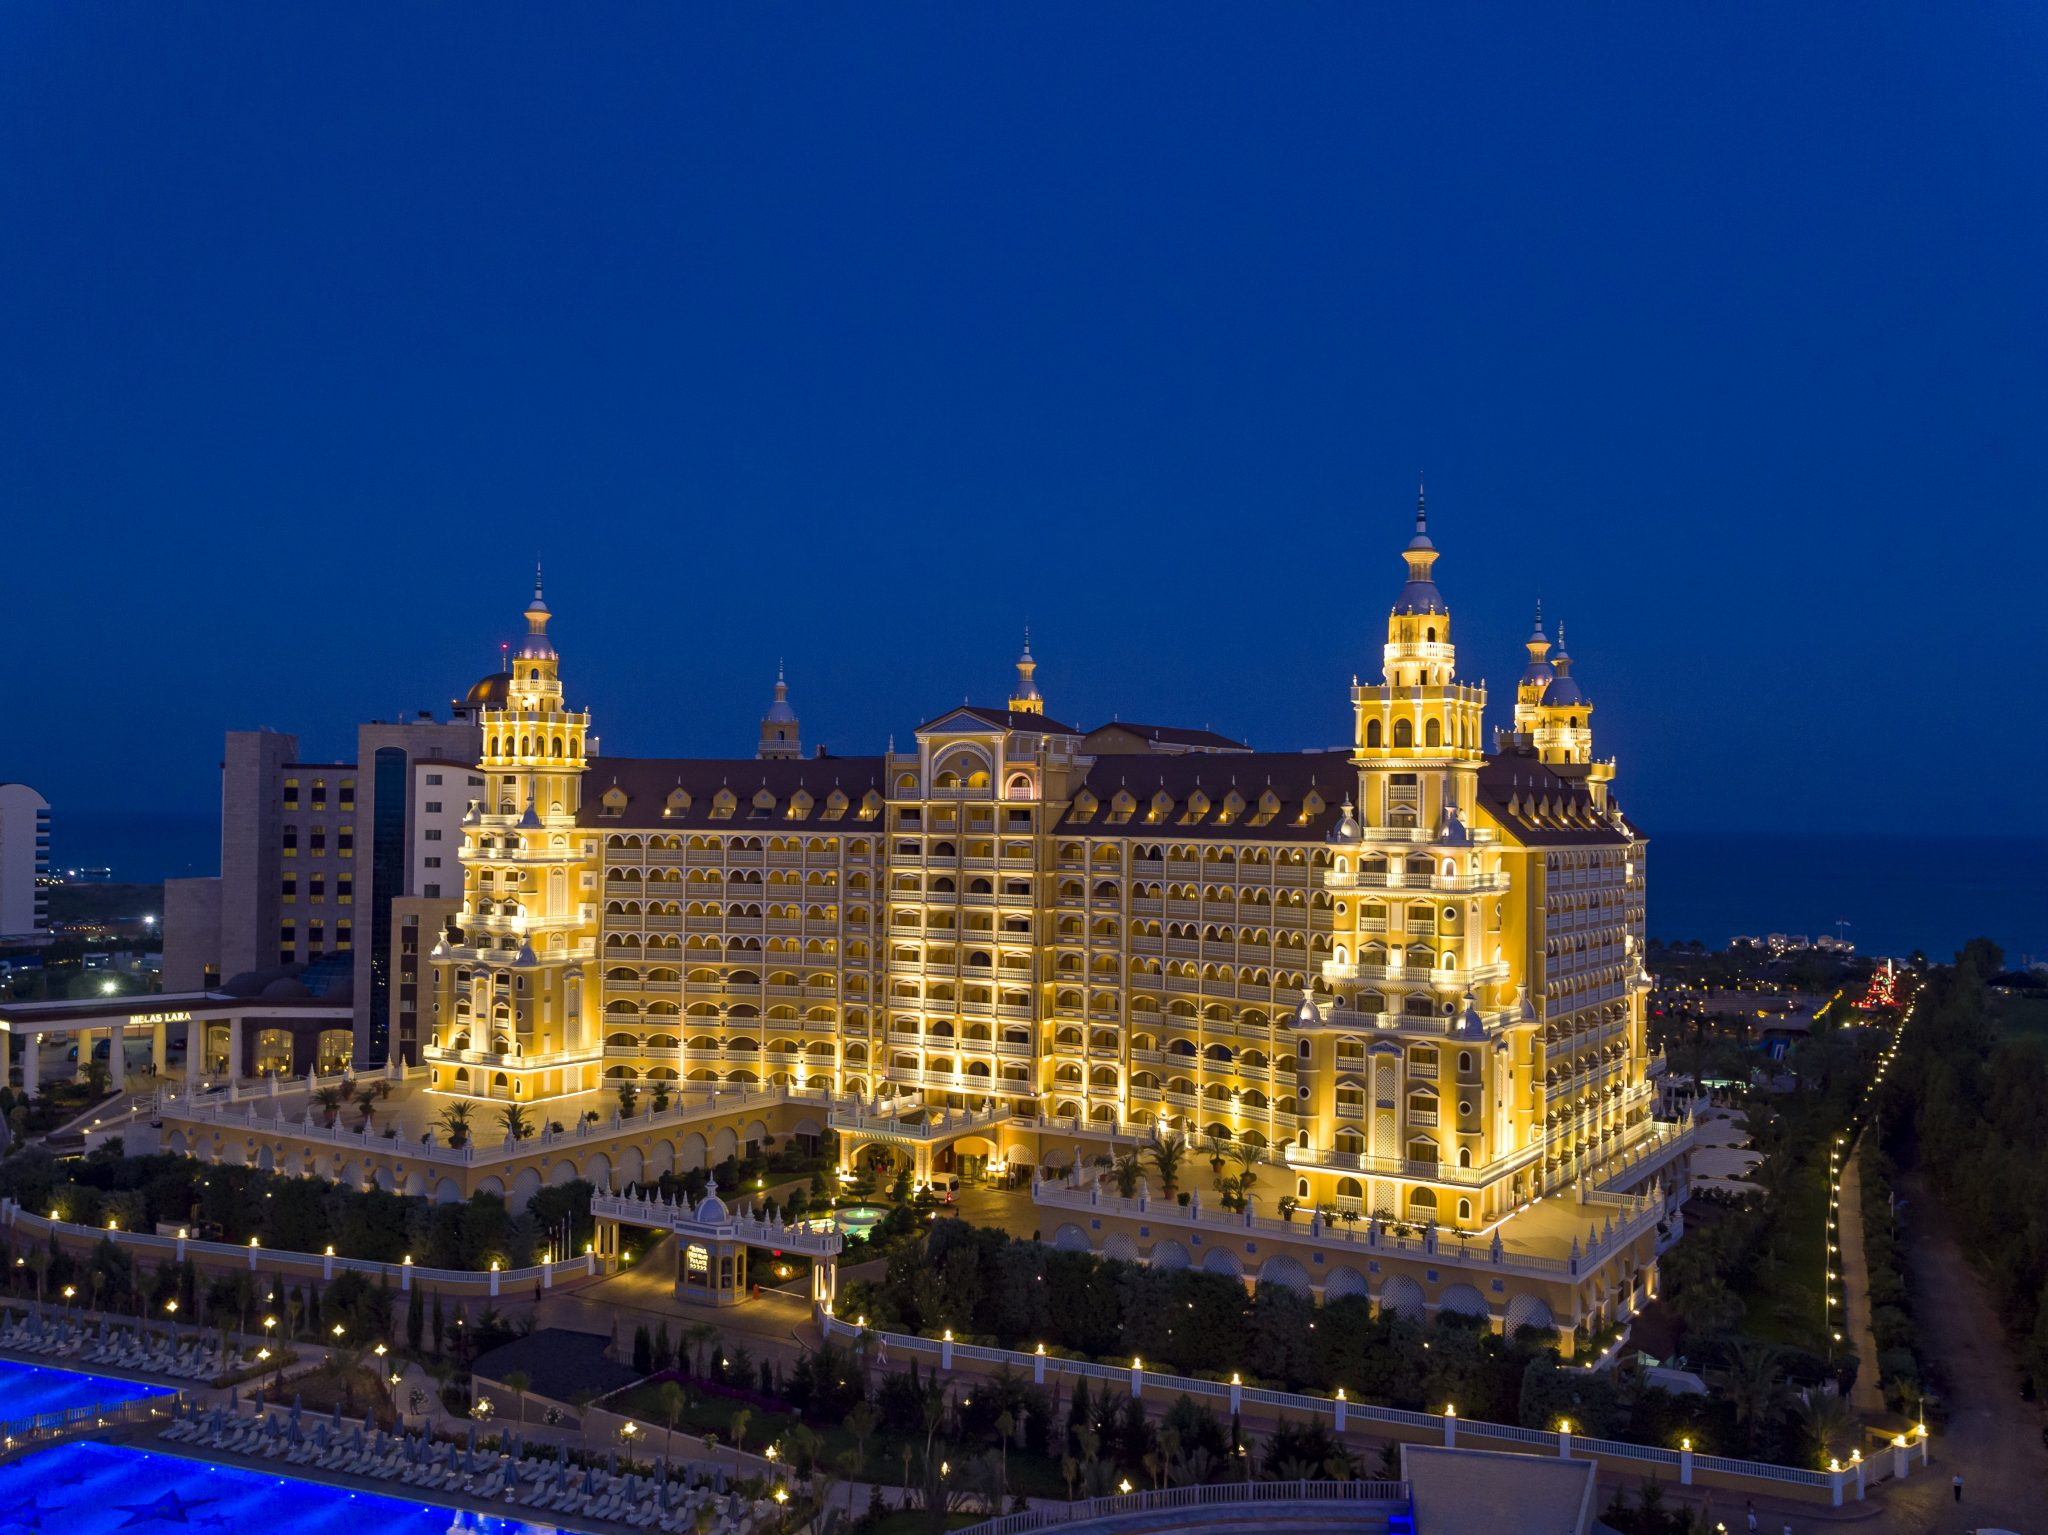 Letovanje_Turska_Hoteli_Avio_Antalija_Hotel_Royal_Holiday_Palace-14-scaled.jpg